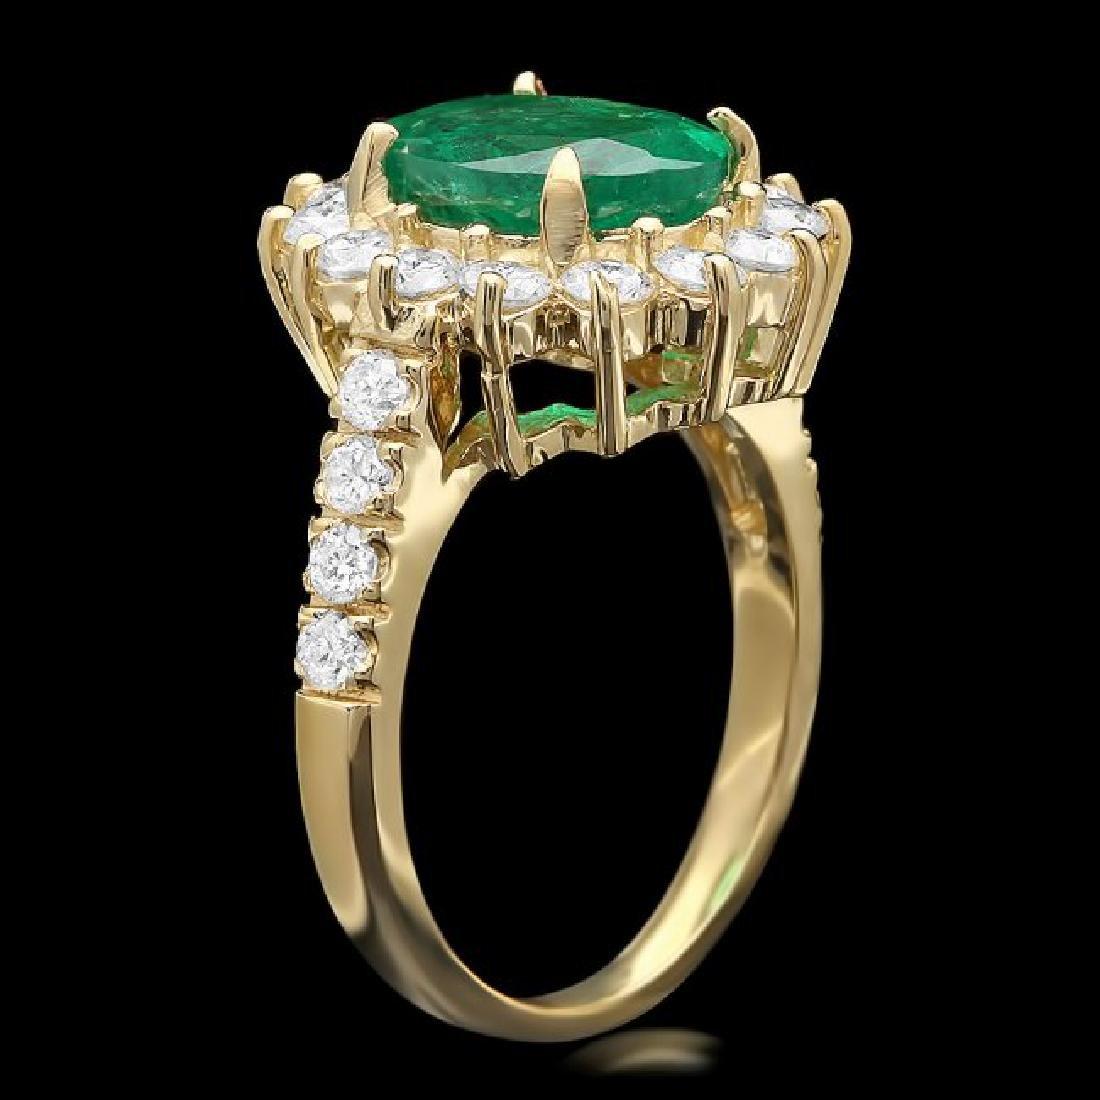 14k Gold 2.50ct Emerald 1.30ct Diamond Ring - 2